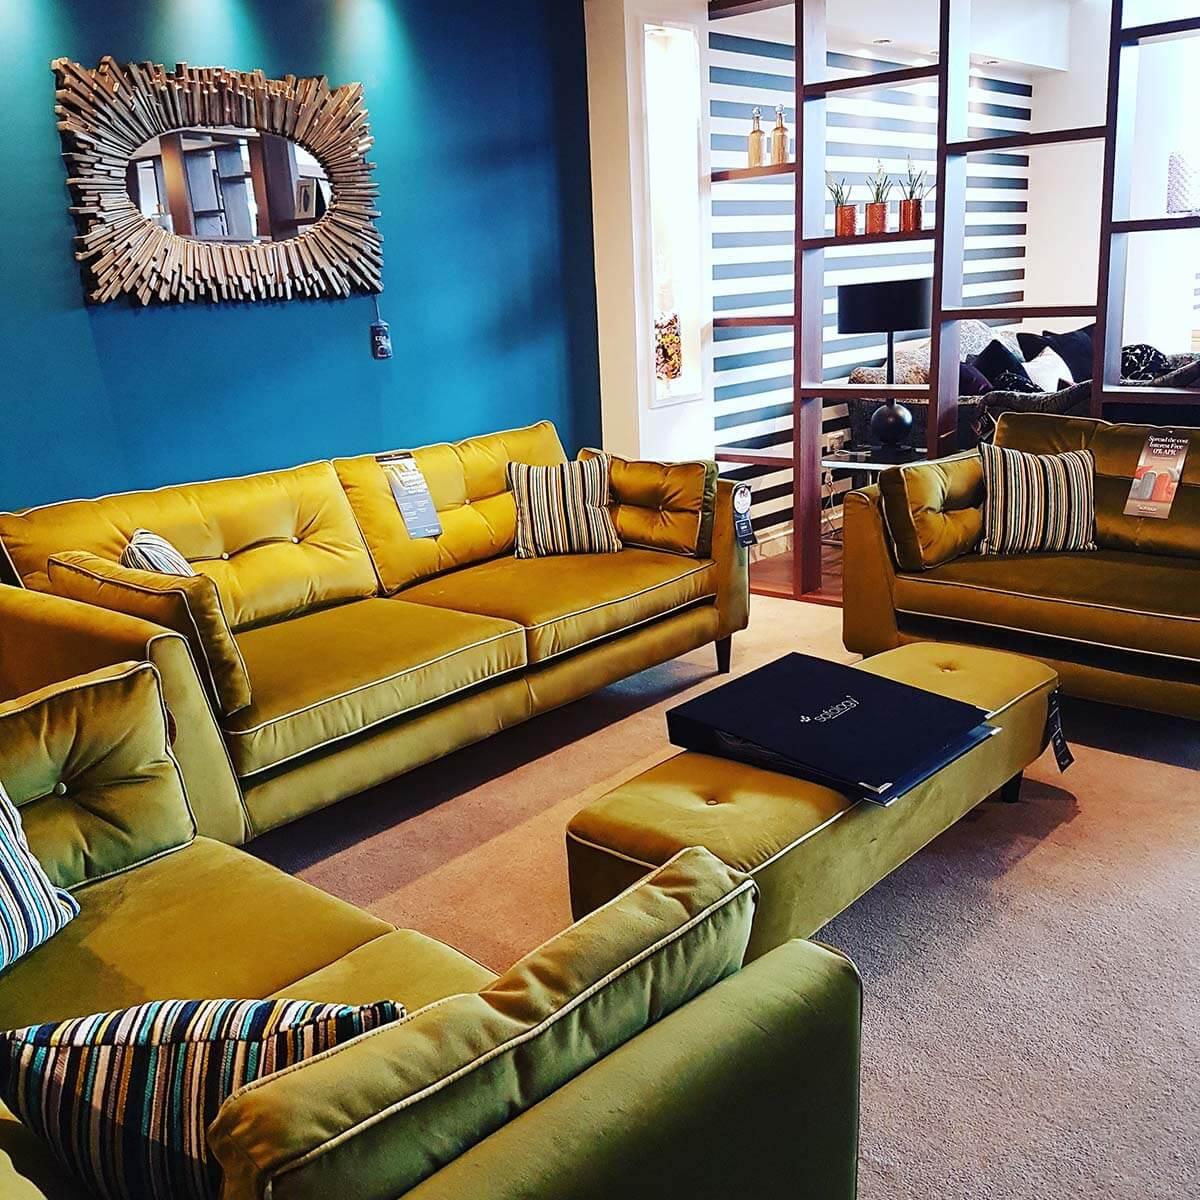 Sofa So Good with Sofology - Crushed Velevet Heaven